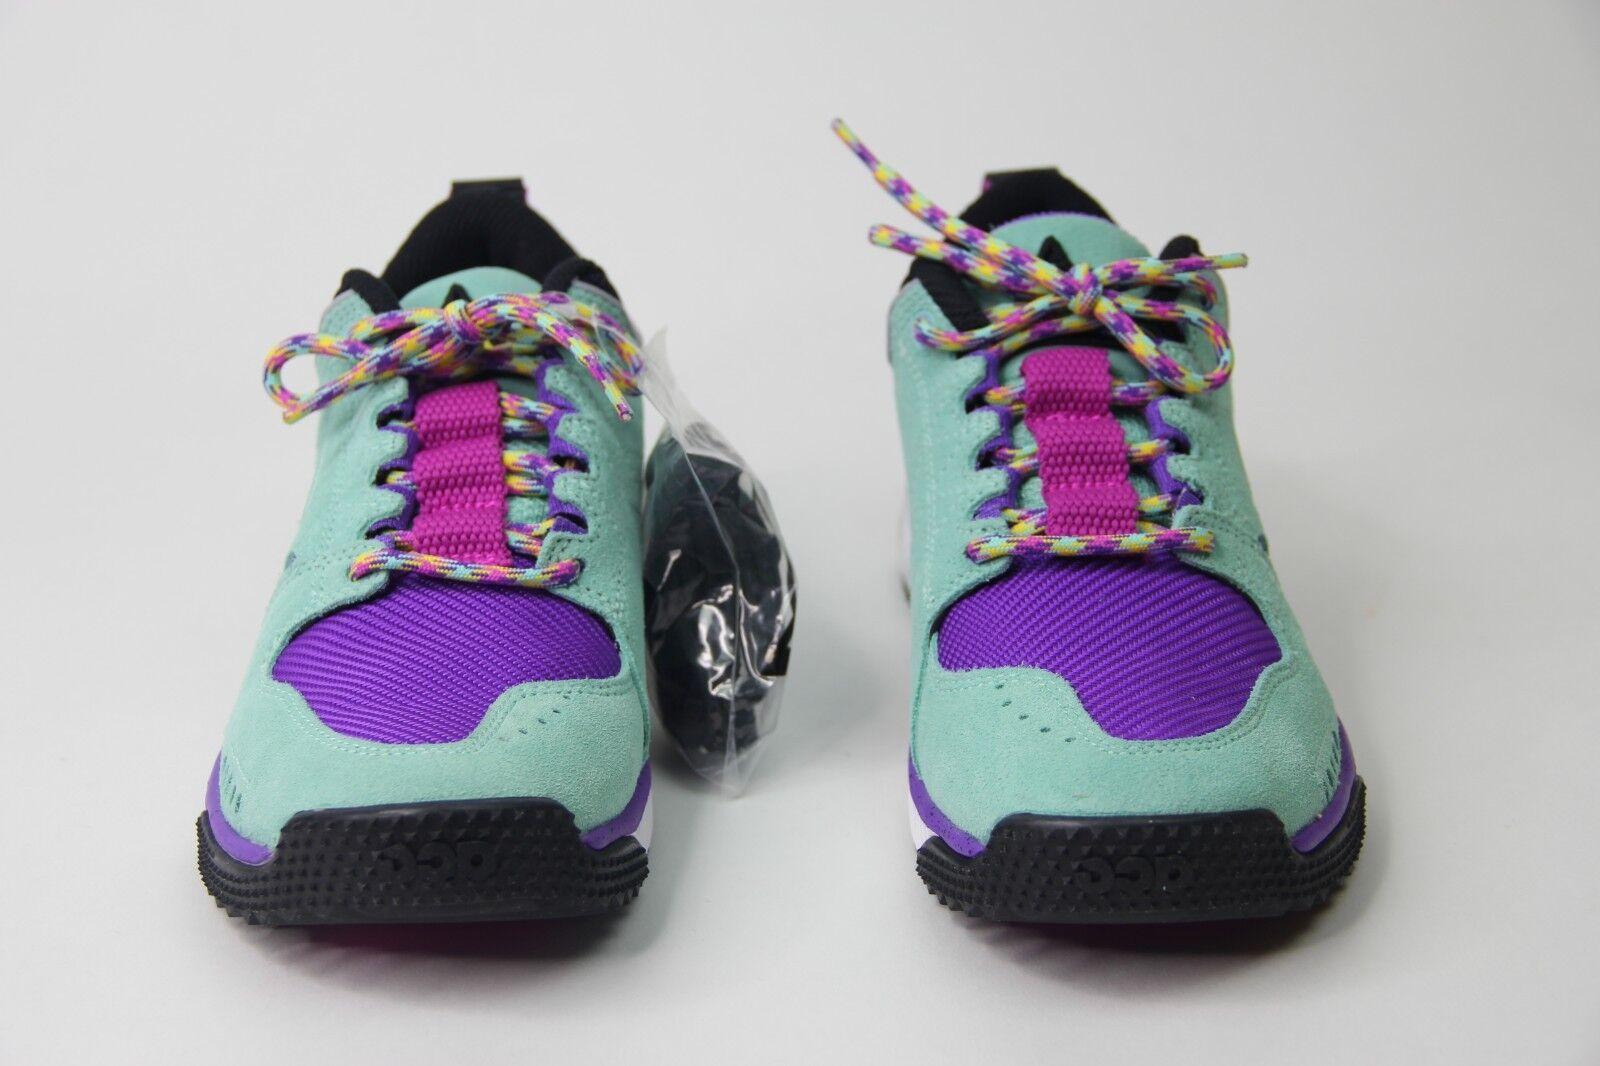 5a15d452a0 Nike ACG Dog Mountain Hiking shoes Emerald Rise bluee Purple AQ0916-300 Mens  SZ 6